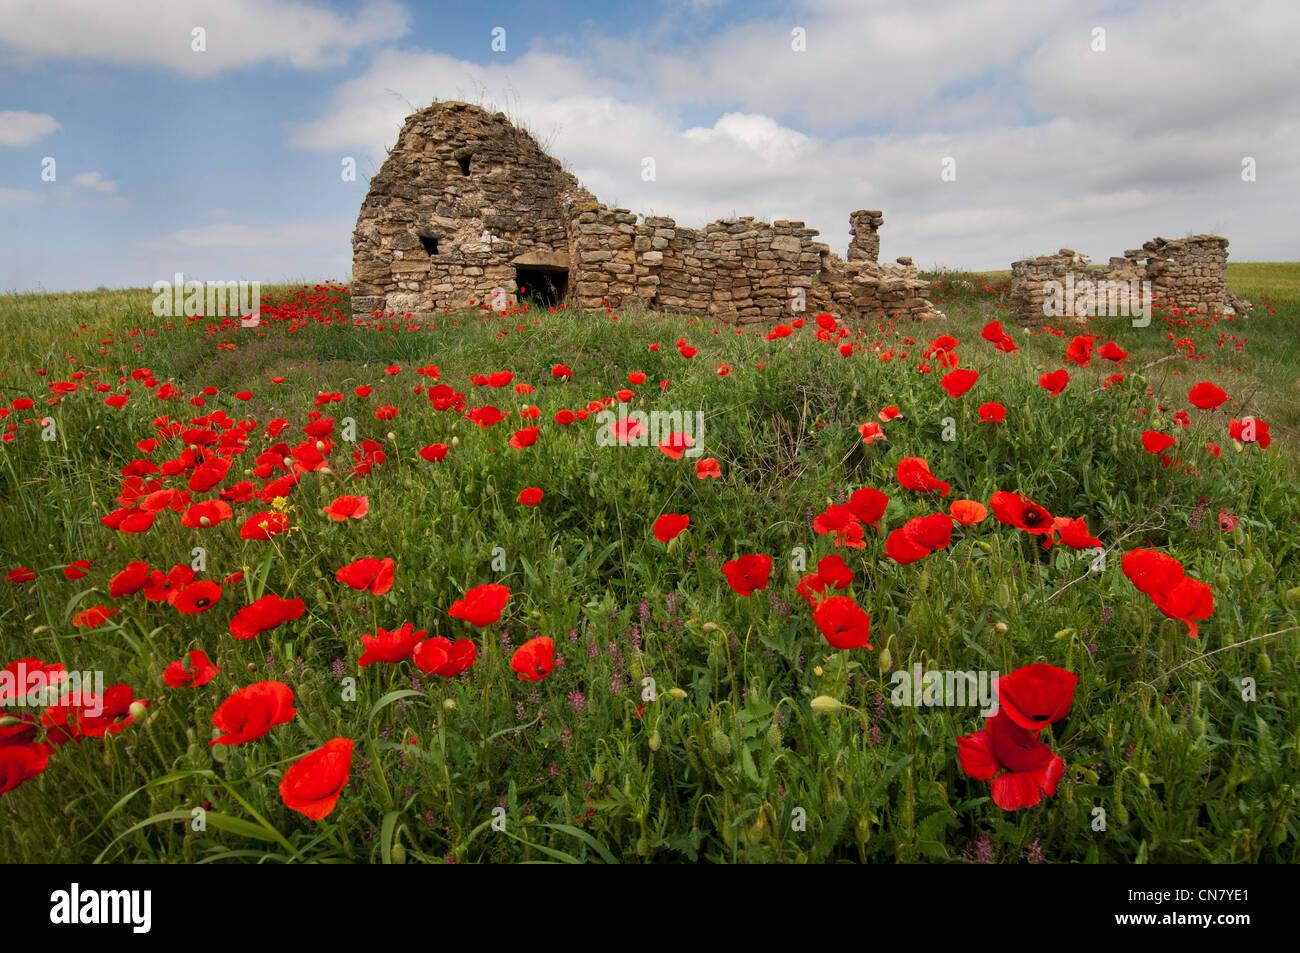 Spain, La Rioja, Logrono, stone shepherd's hut like a provencal borie, amidst a flower - Stock Image